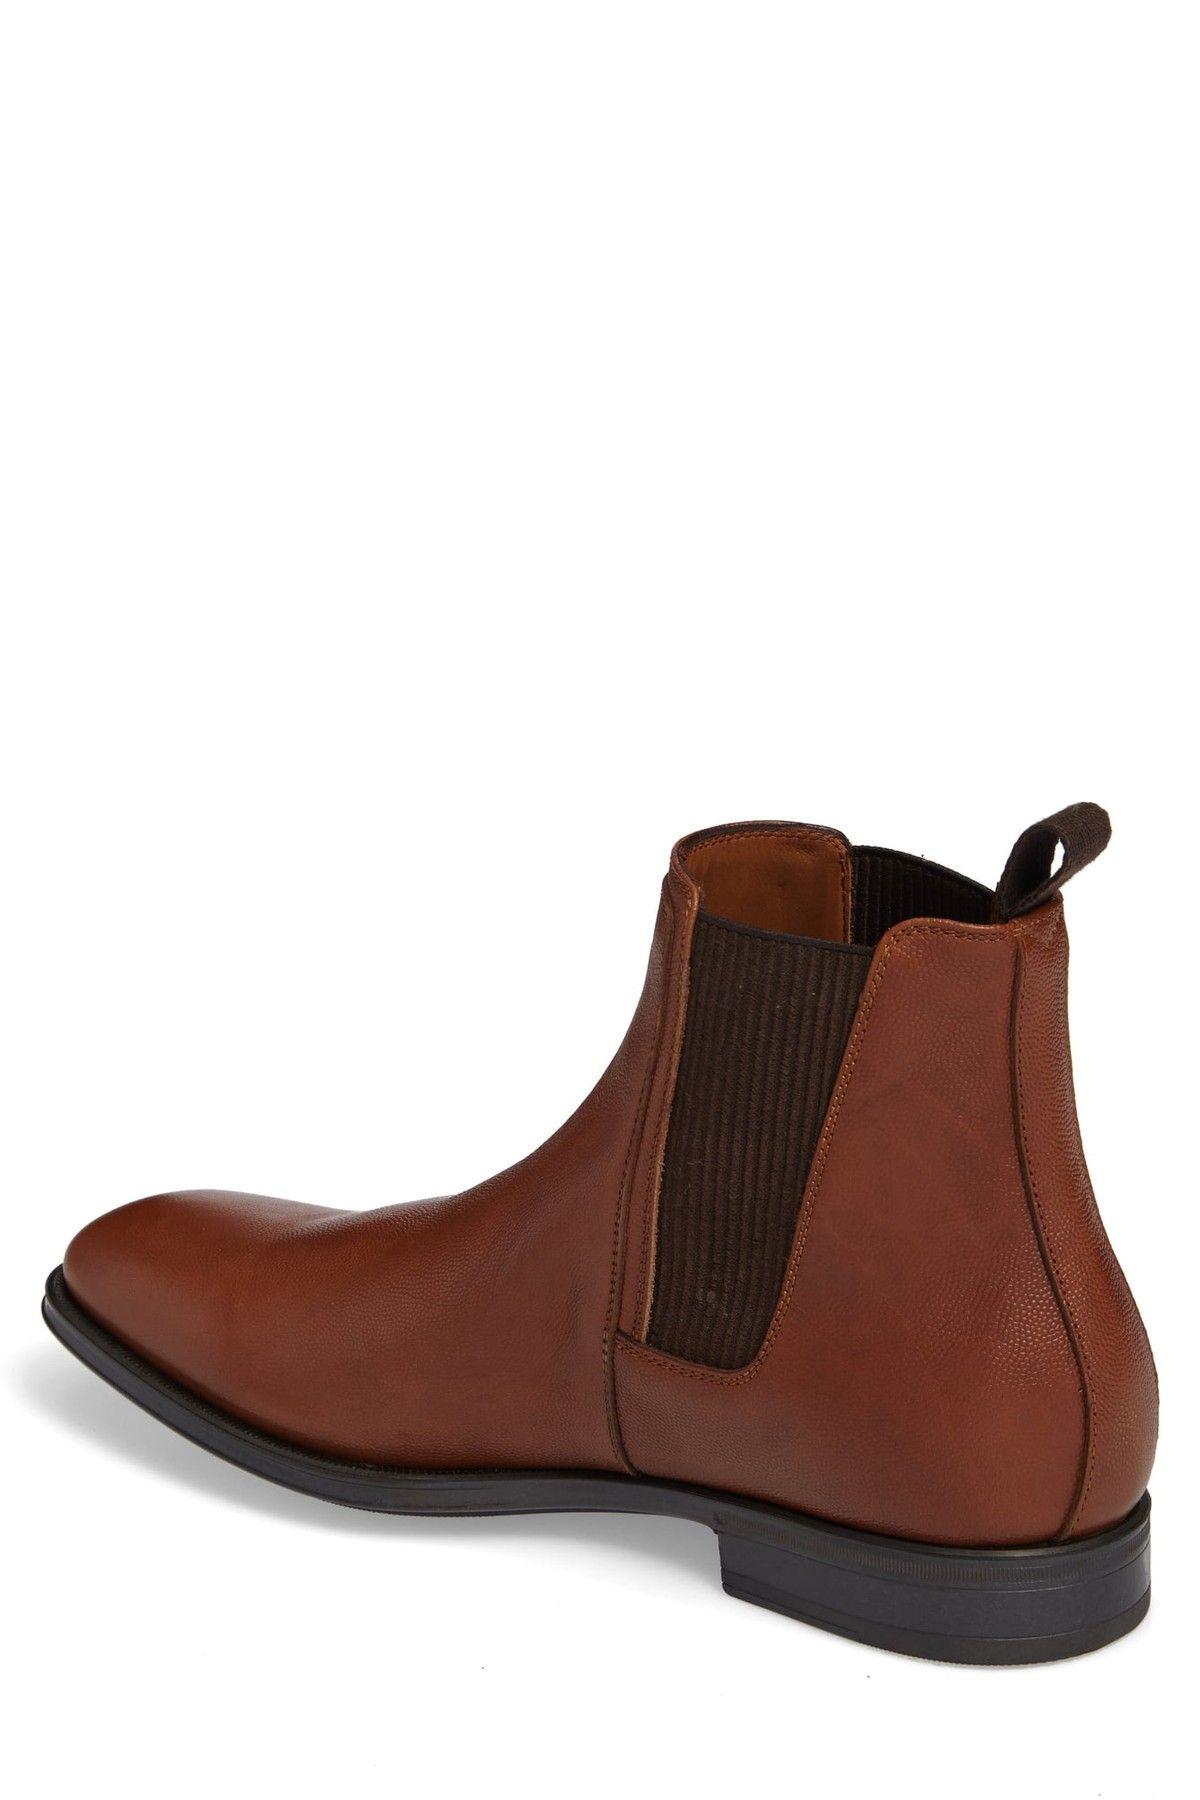 Aquatalia | Damon Chelsea Boot | Chelsea boots, Boots, Chelsea